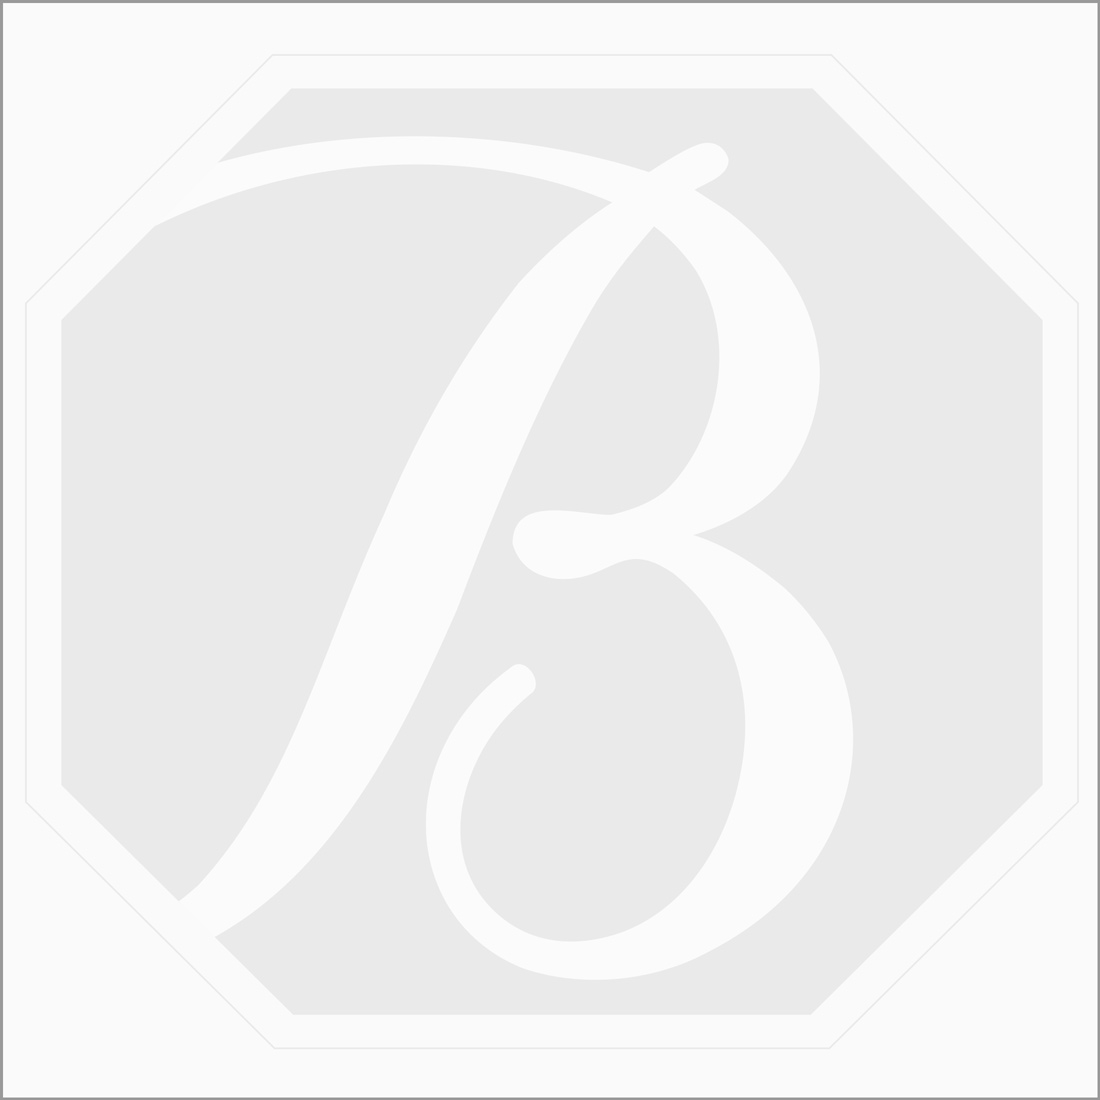 11 x 7.50 mm - Dark Maroon Rose Cut Diamond Cushion Shape - 4.96 carats (FncyDiaRC1011)